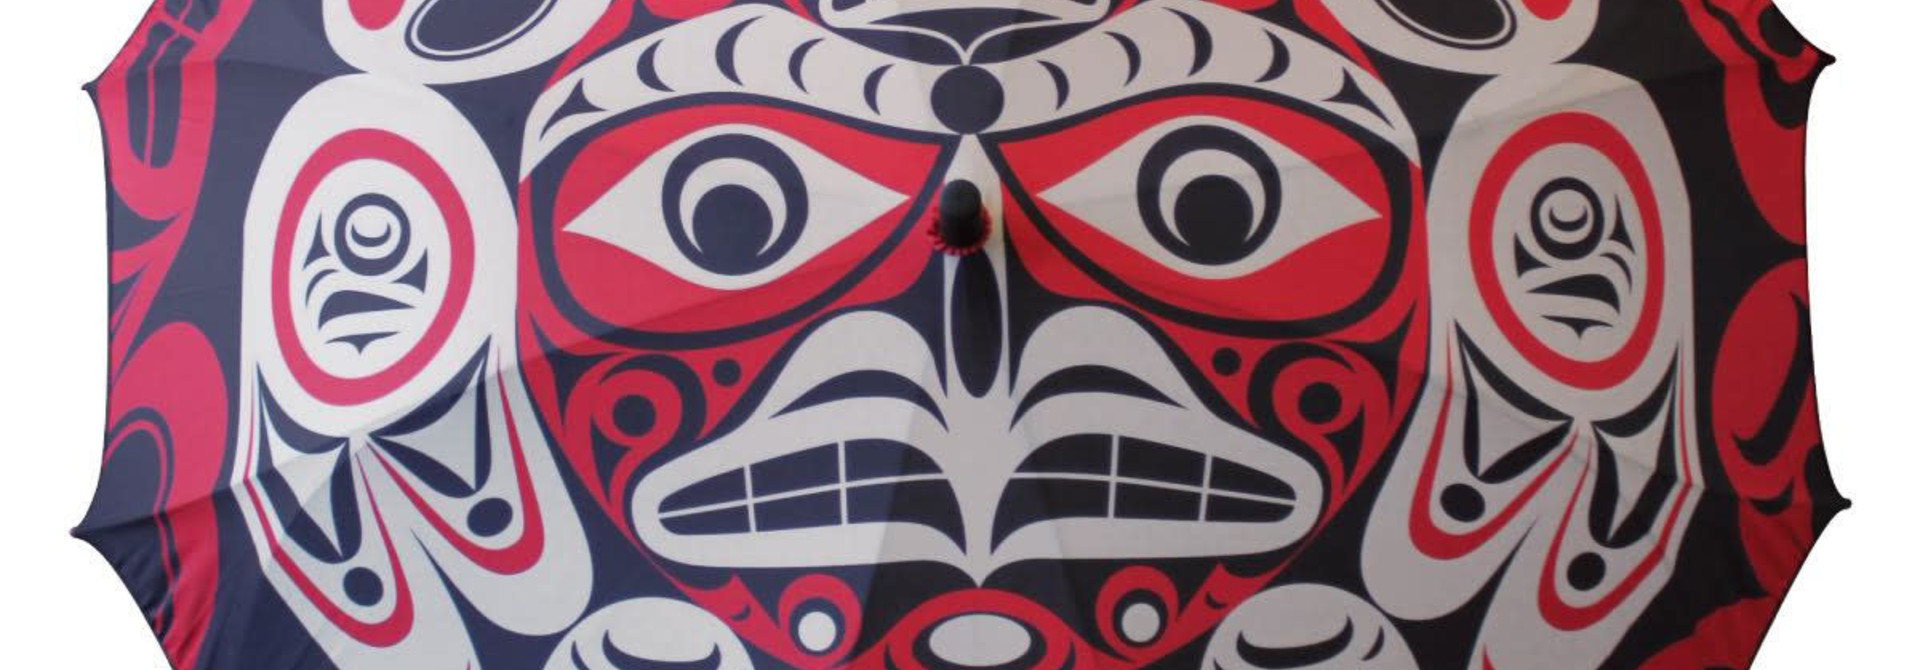 Pacific Umbrella- Thunderbird Moon by Joe Wilson-Sxwaset